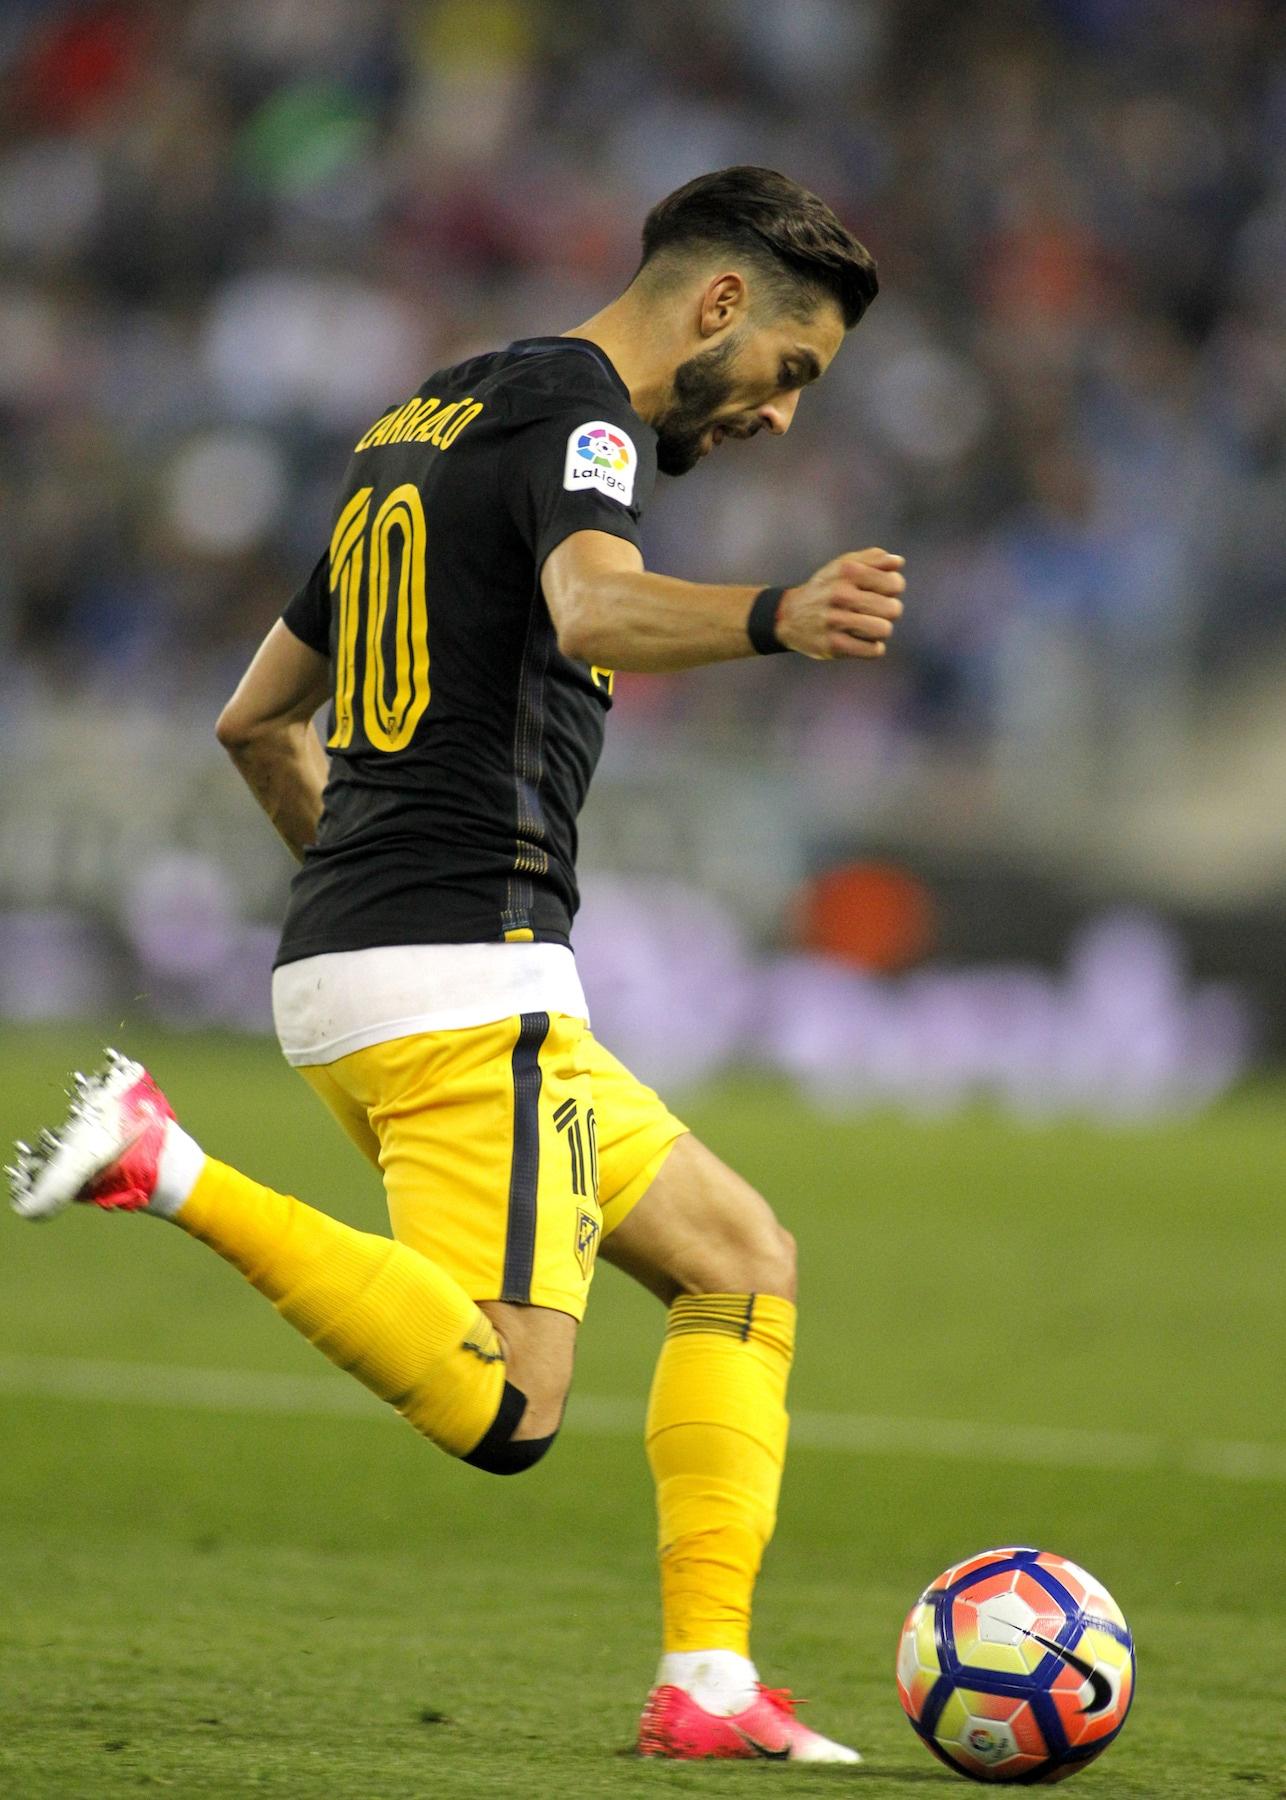 Yannick Ferreira Carrasco gaya rambut pemain sepak bola.